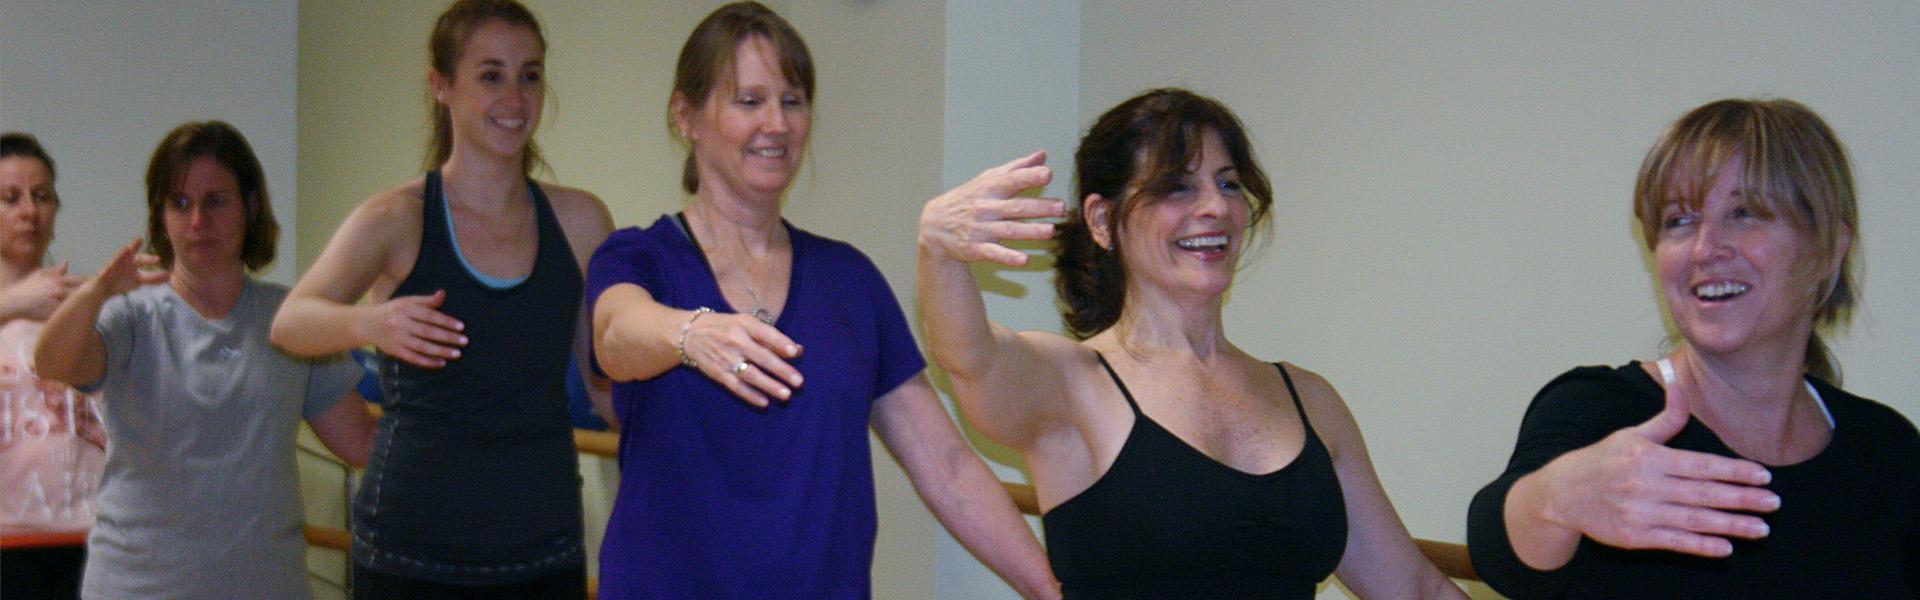 Personal-Euphoria-Pilates-CT-Barre-Class-2